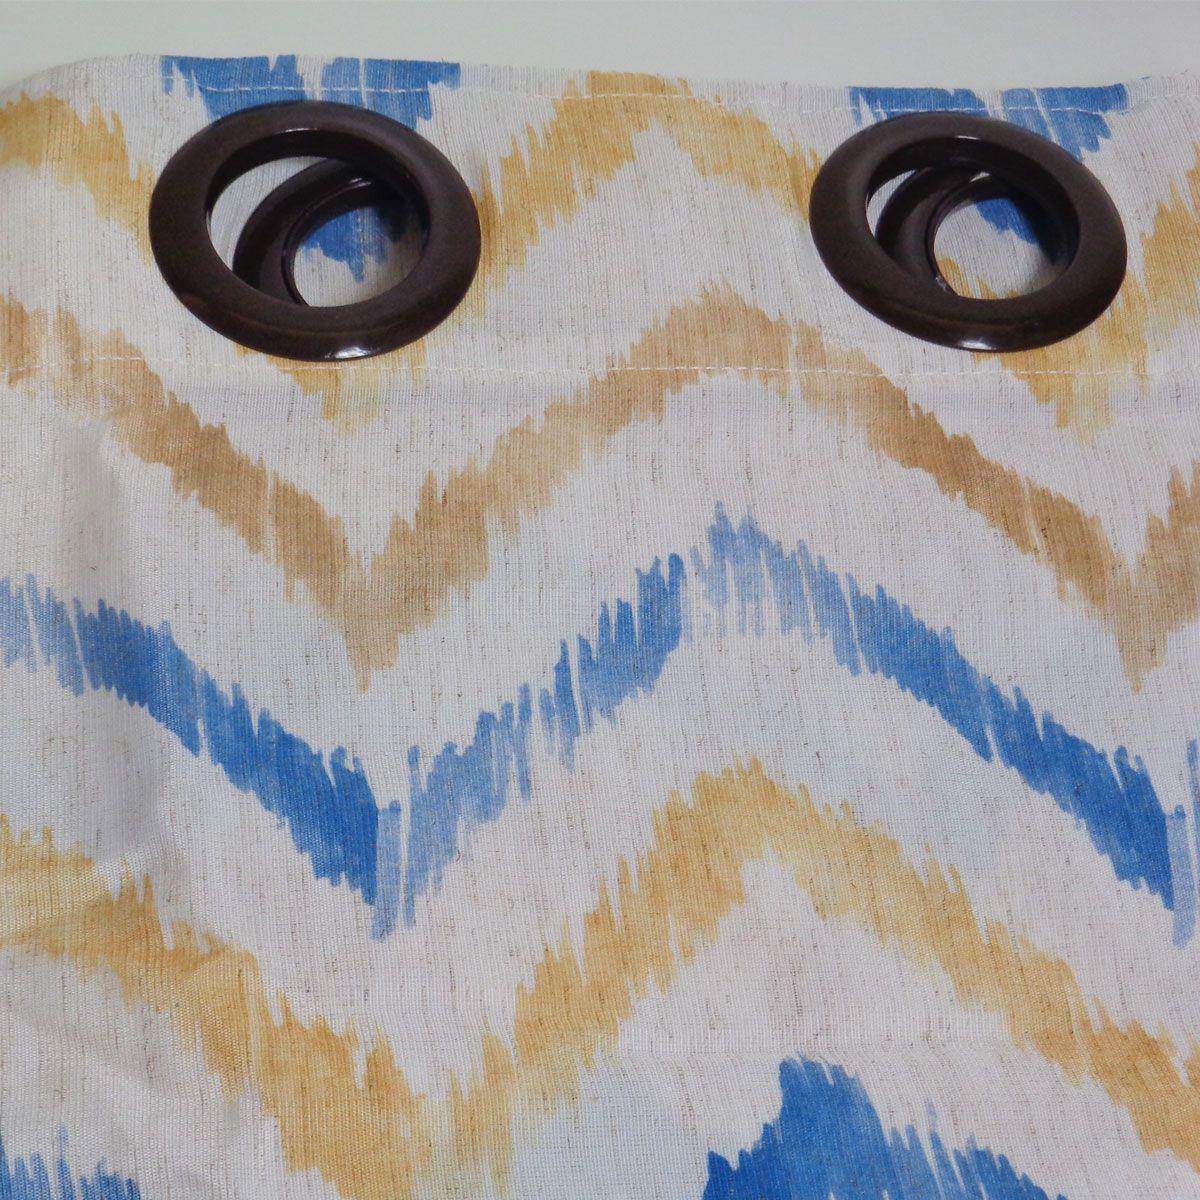 Cortina Sala Rústica Spazio Zig Zag 2,60 x 1,70 Bella Janela